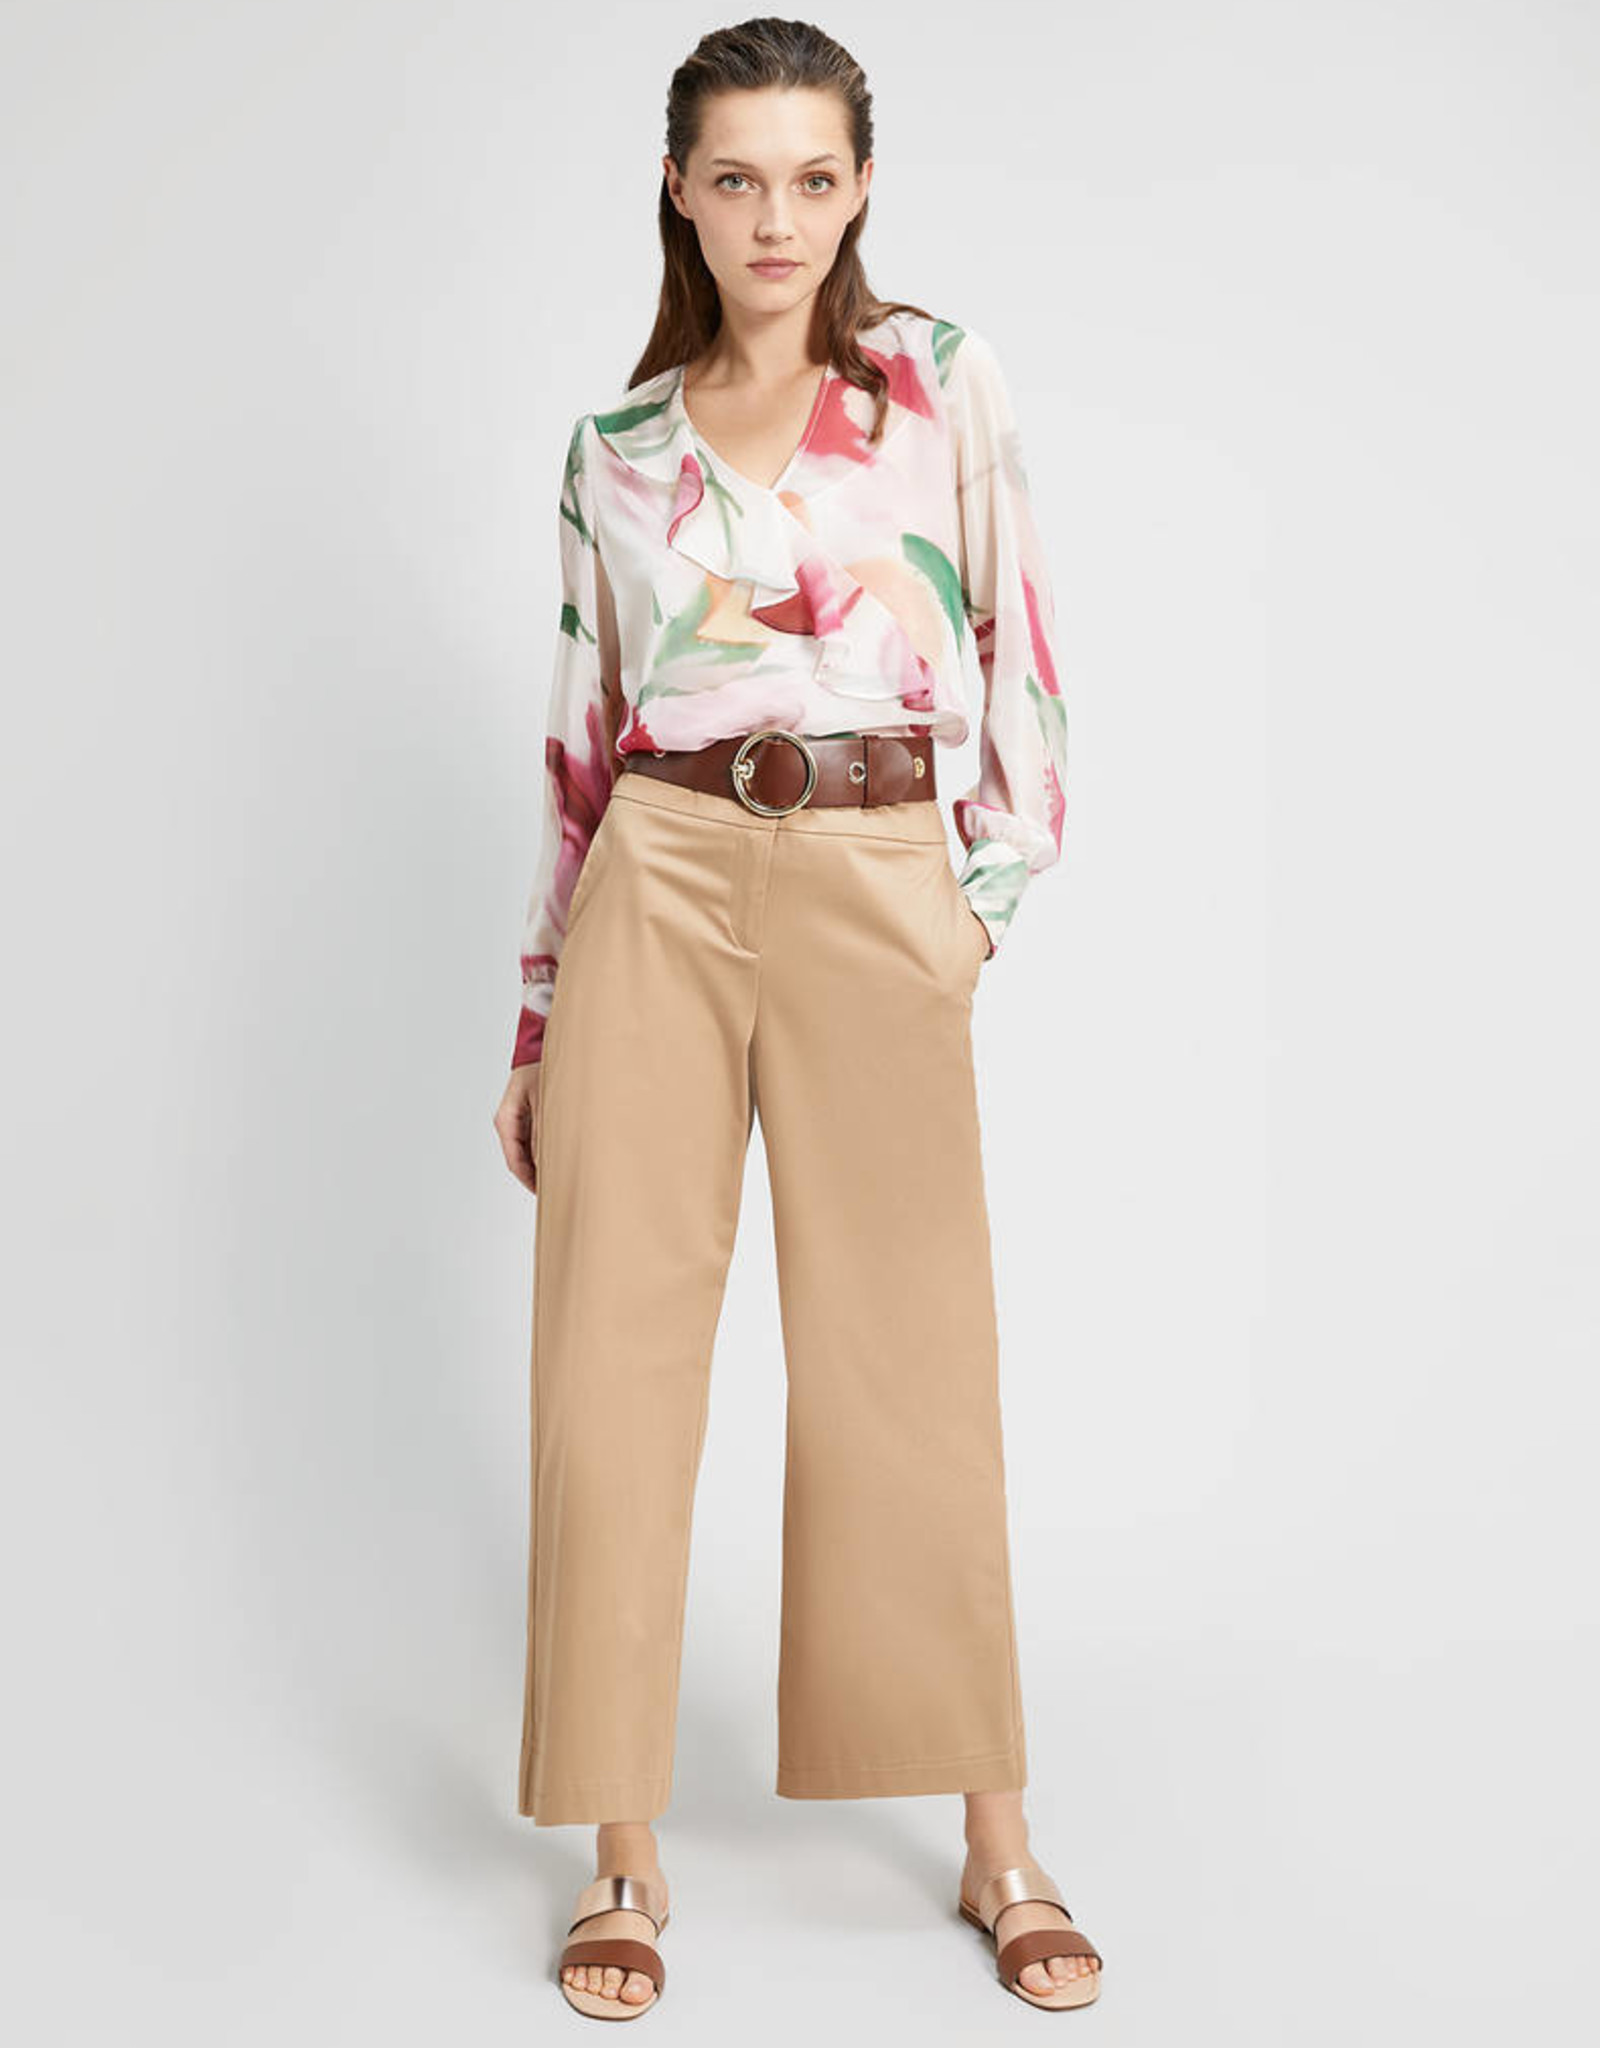 PENNYBLACK Pantalone Uni Camel